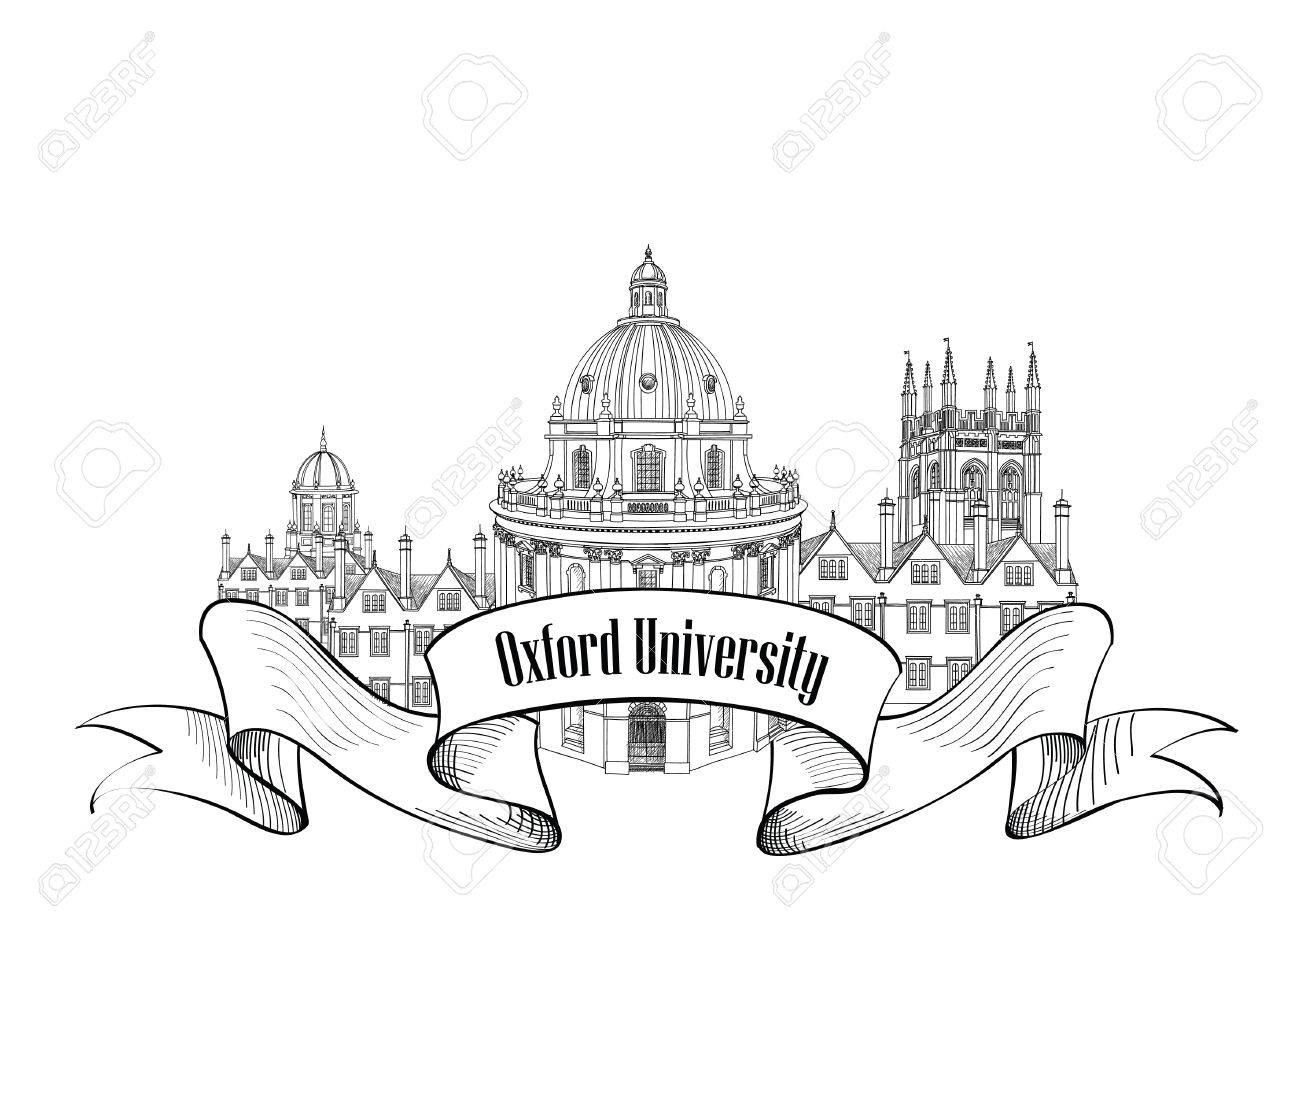 1300x1099 Oxford Univercity Label. Oxford City Skyline Engraved